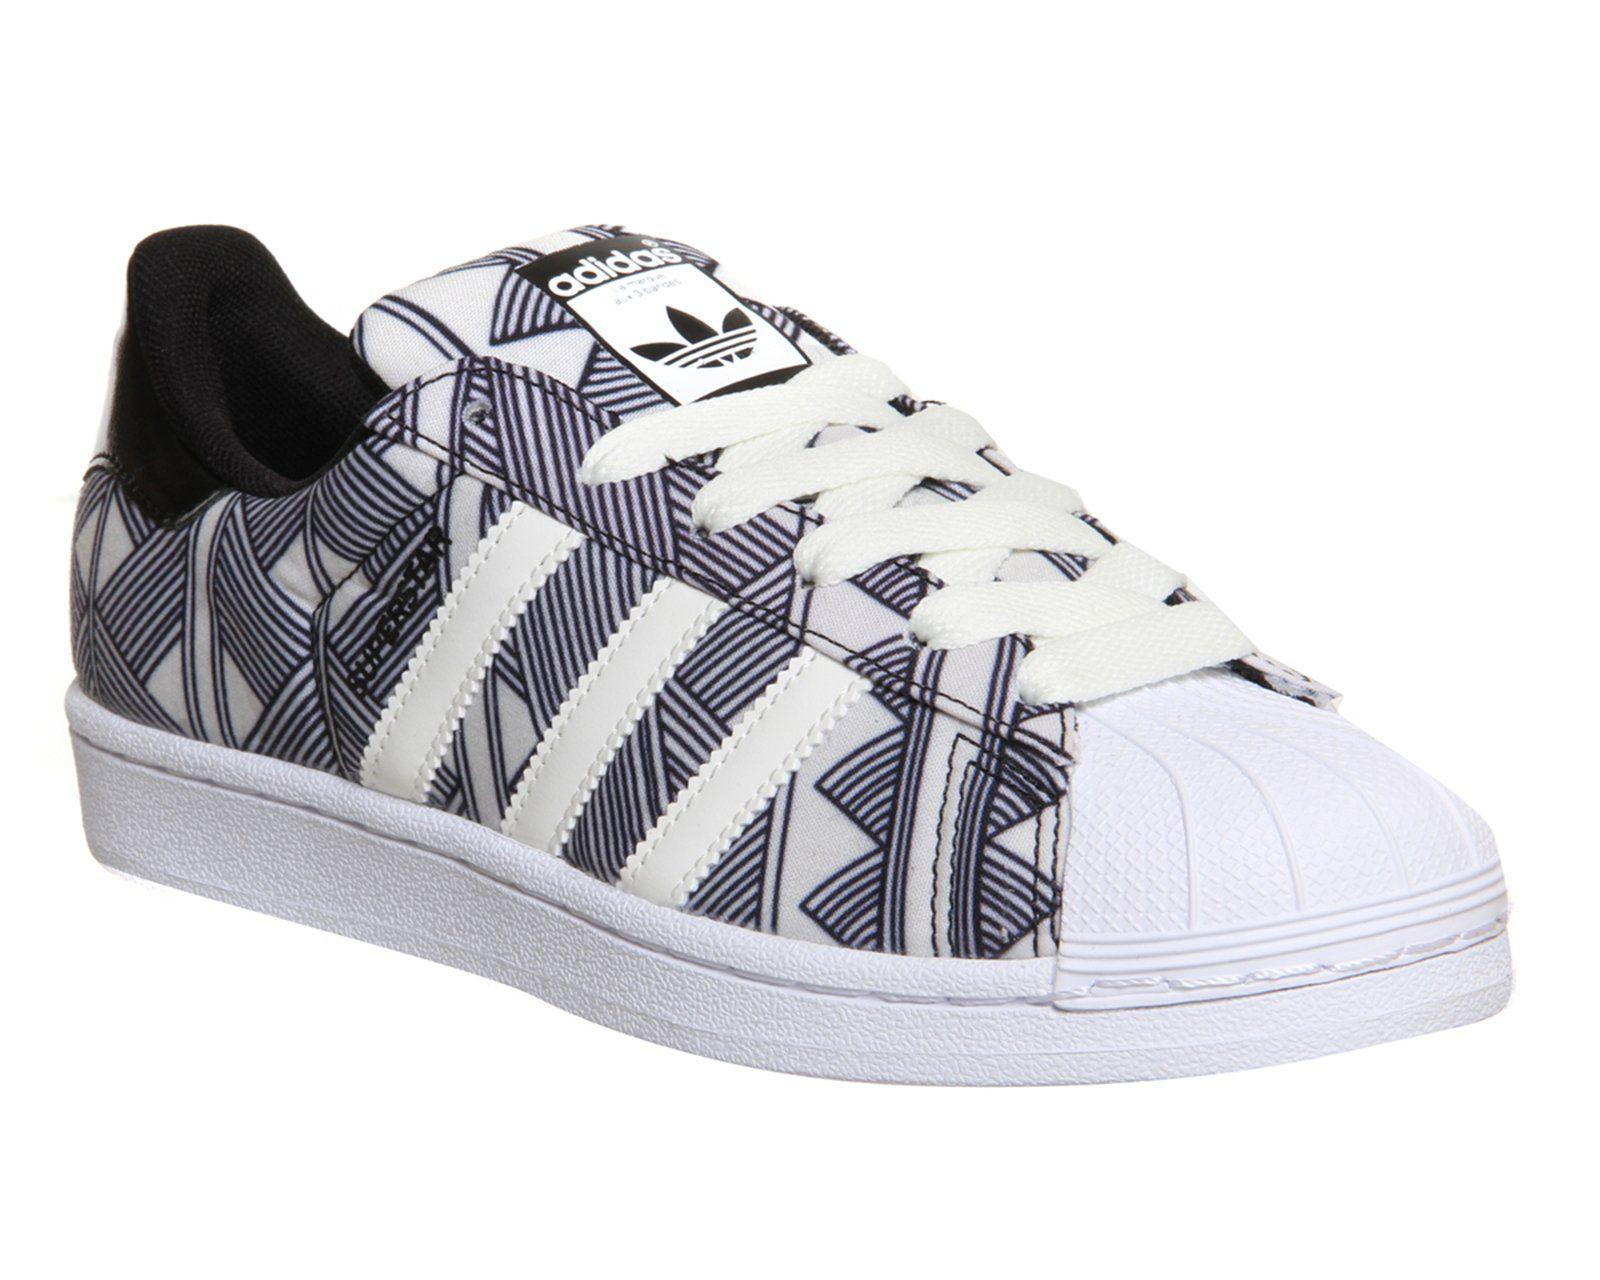 adidas Originals Superstar Trainers Bundle Mens Shoes Joblot